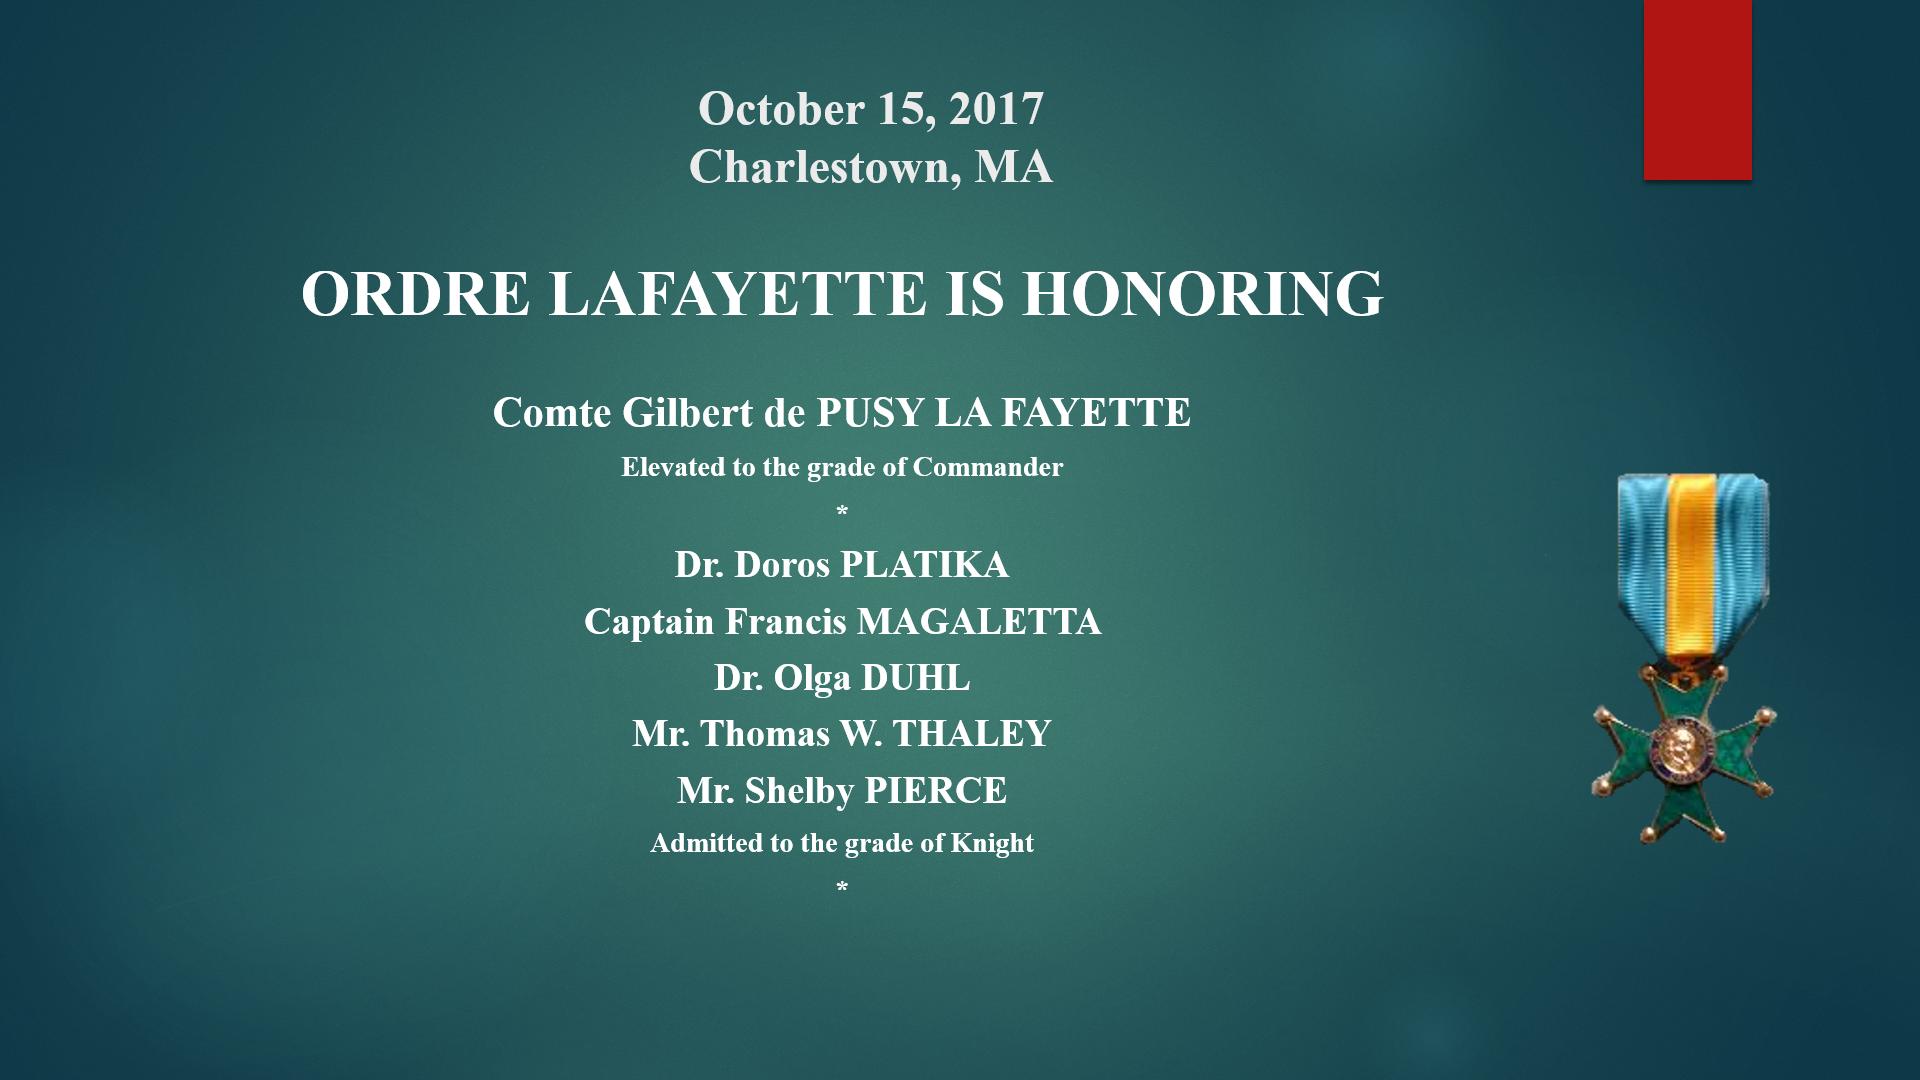 OL- Honoring - Charlestown 15 oct 2017